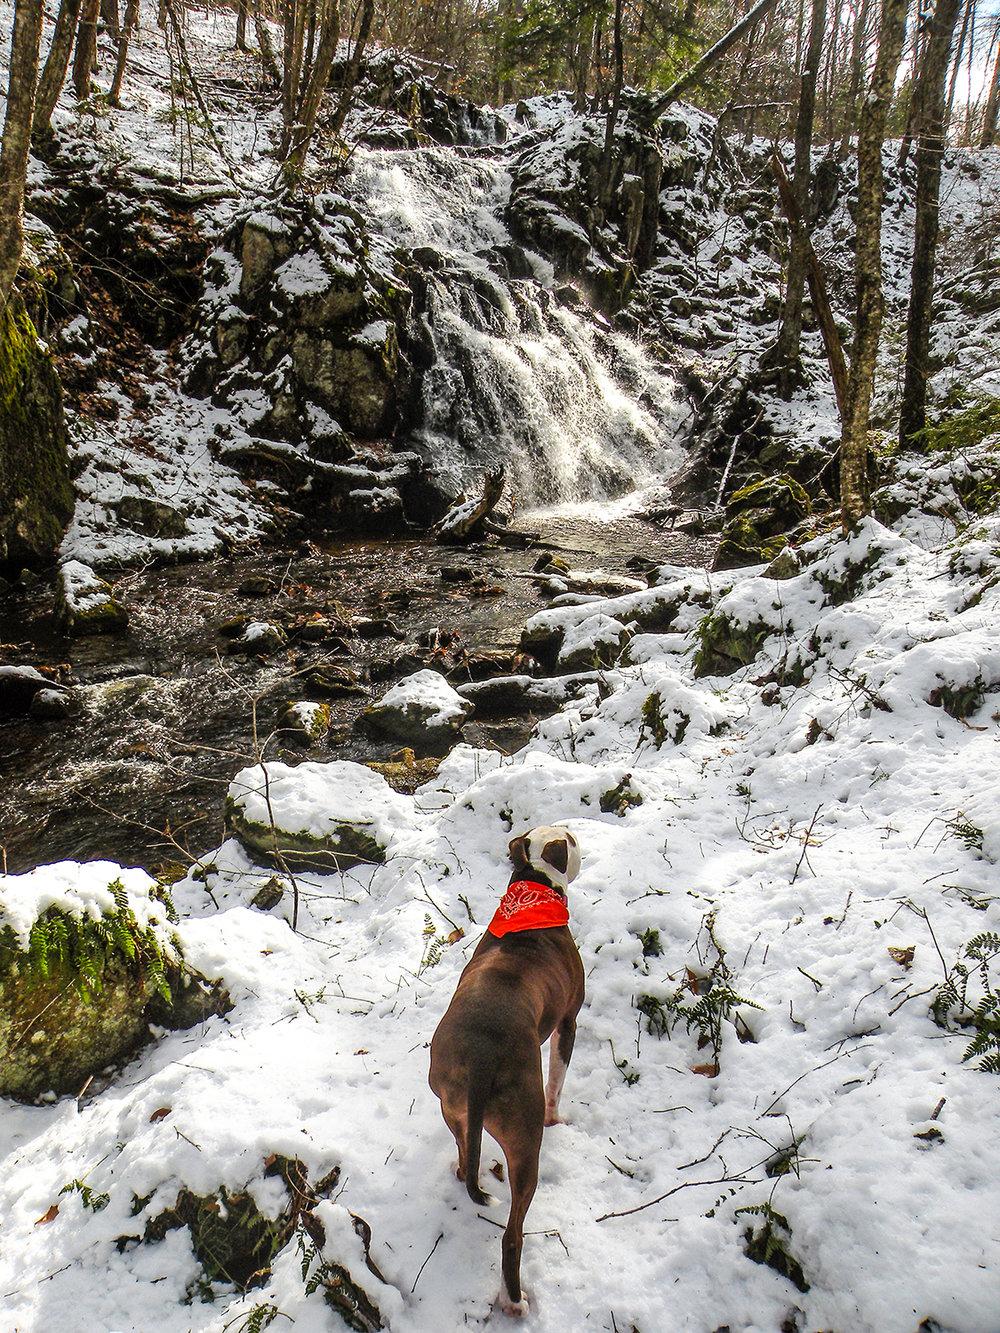 Vly Creek Falls is a 30-foot, distinctive waterfall.   Bill Ingersoll